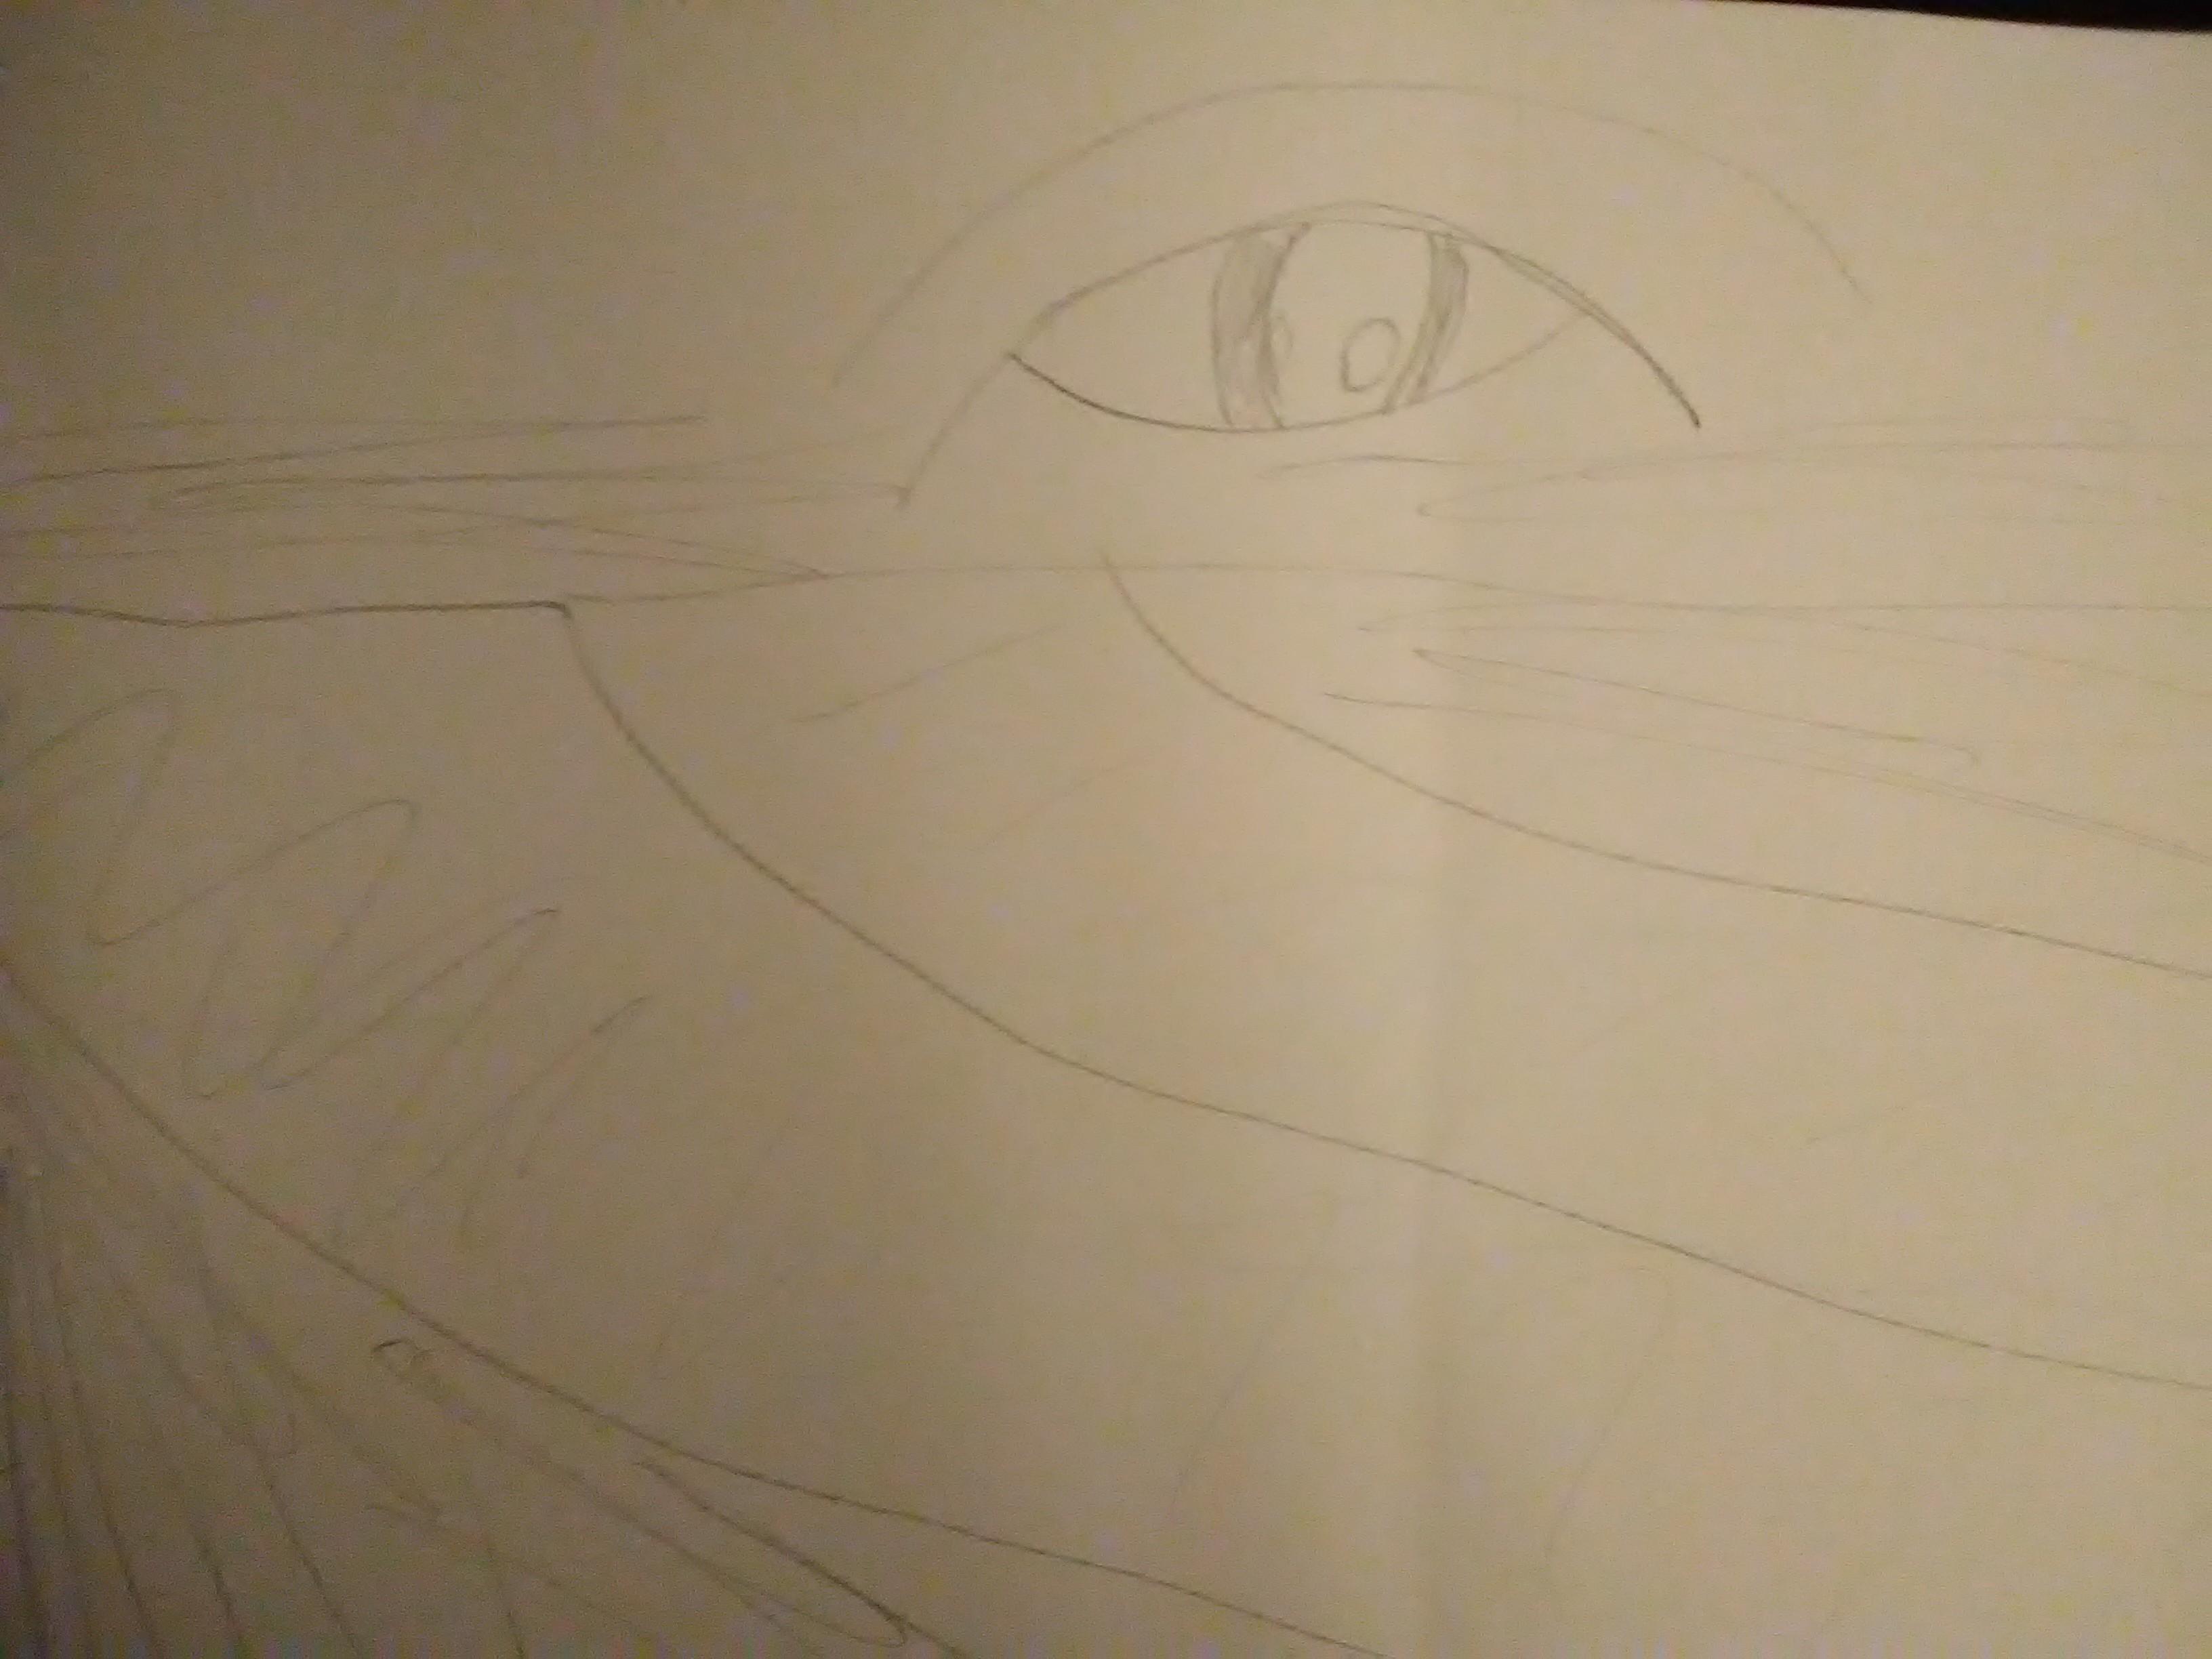 Sketch Of Surrealist Photo 2